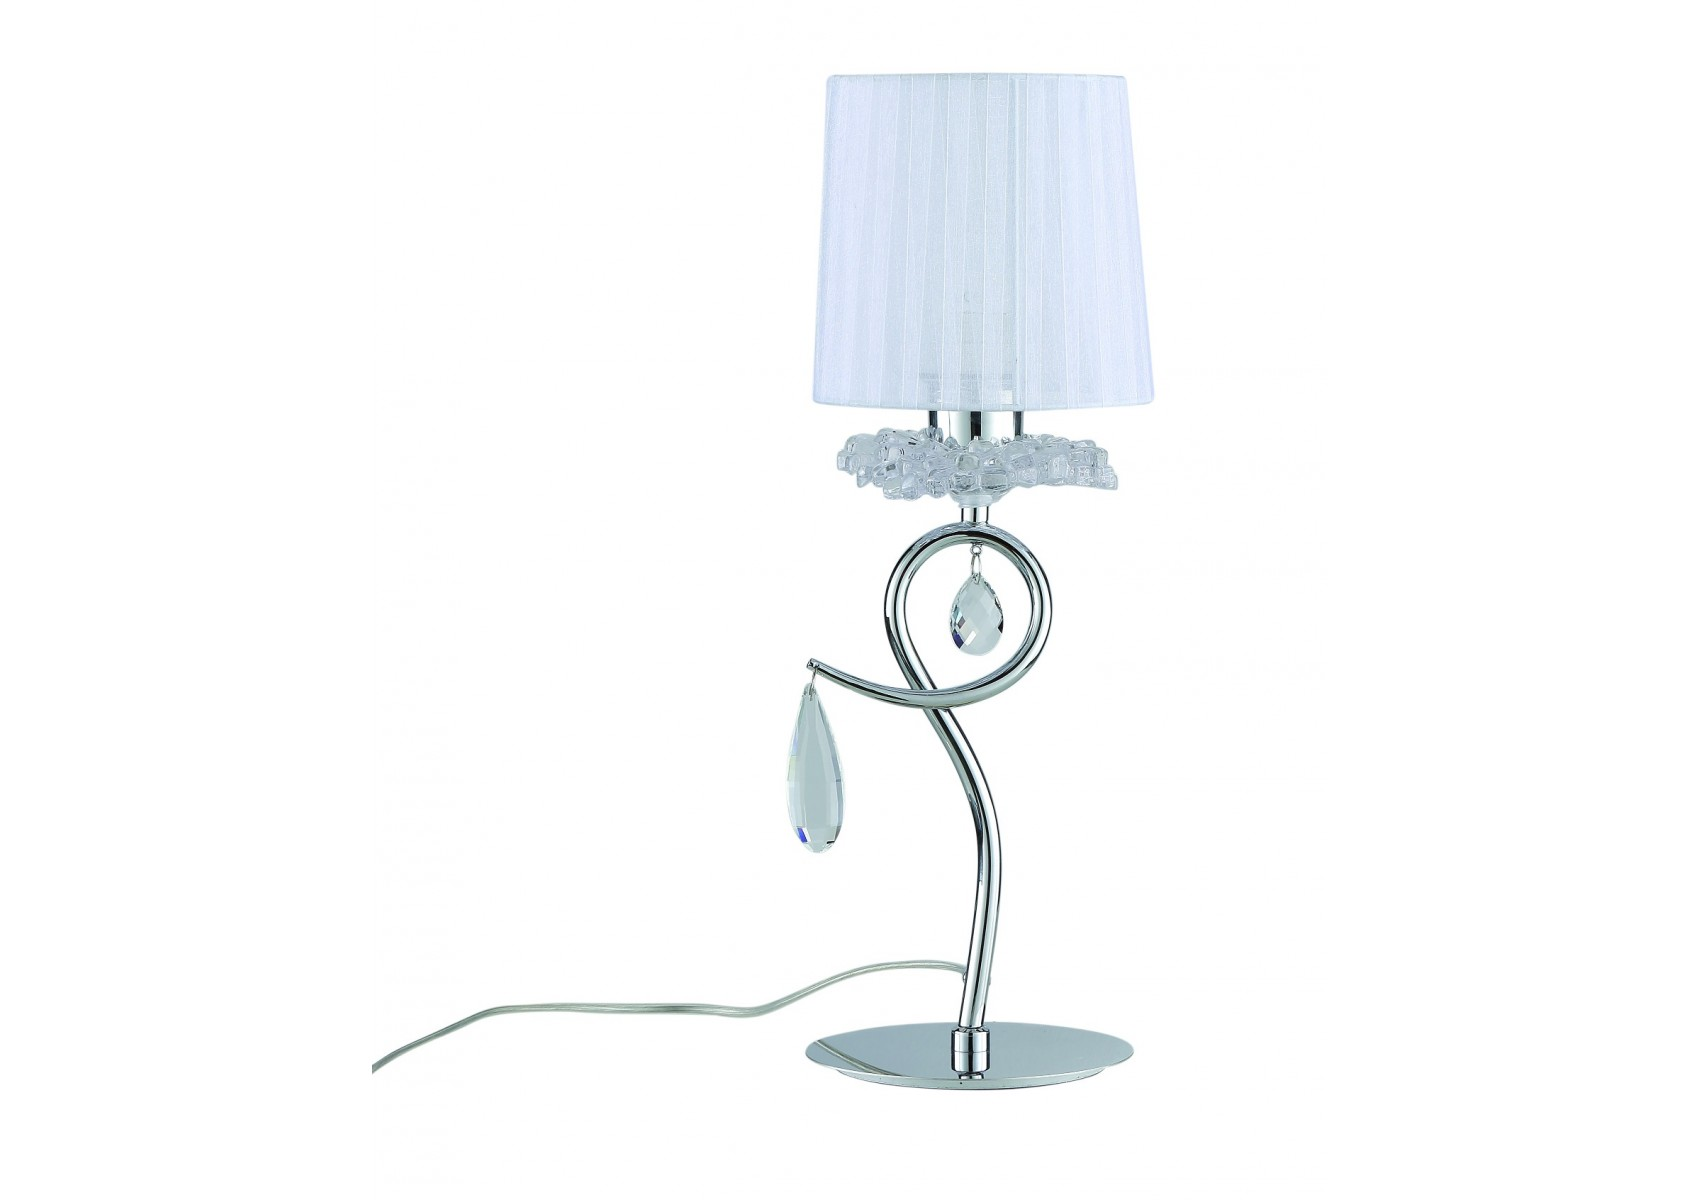 Lampe baroque louise boite design for Lampe a poser baroque